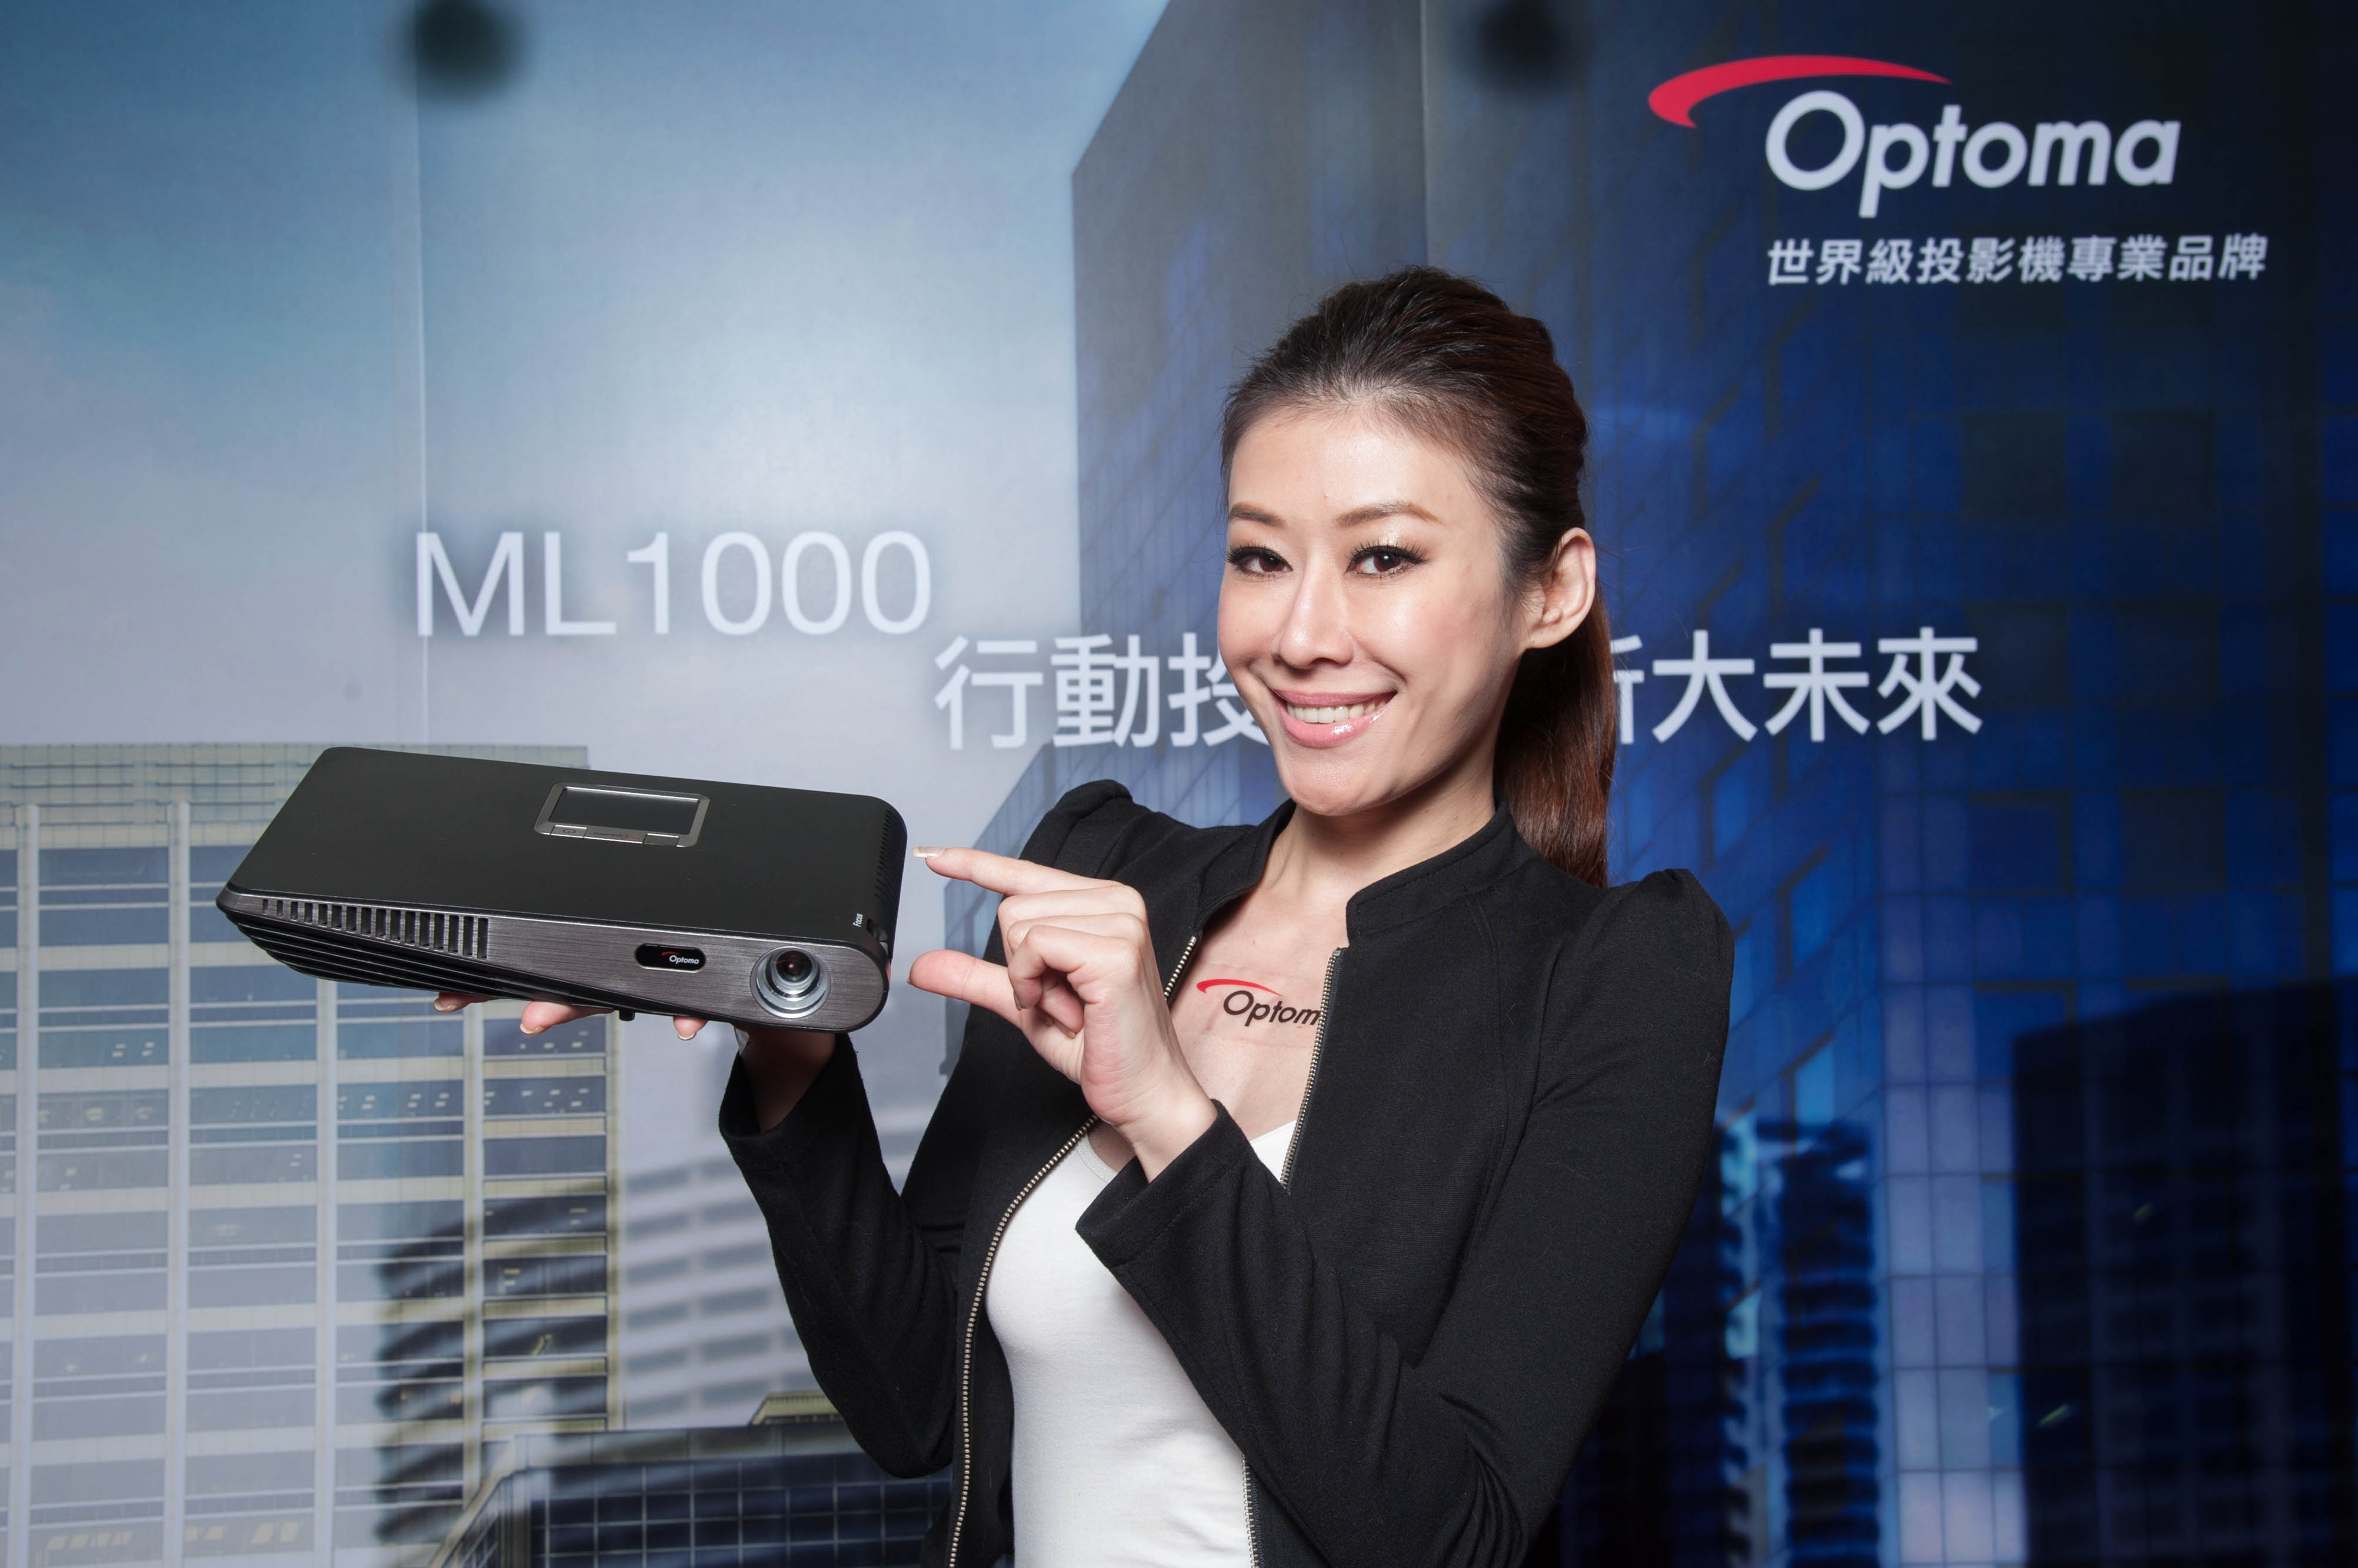 Optoma感恩回饋,祭出高亮度500流明行動投影機ML500不到1.5萬元 資訊月首次展出超高精細度3D印表機